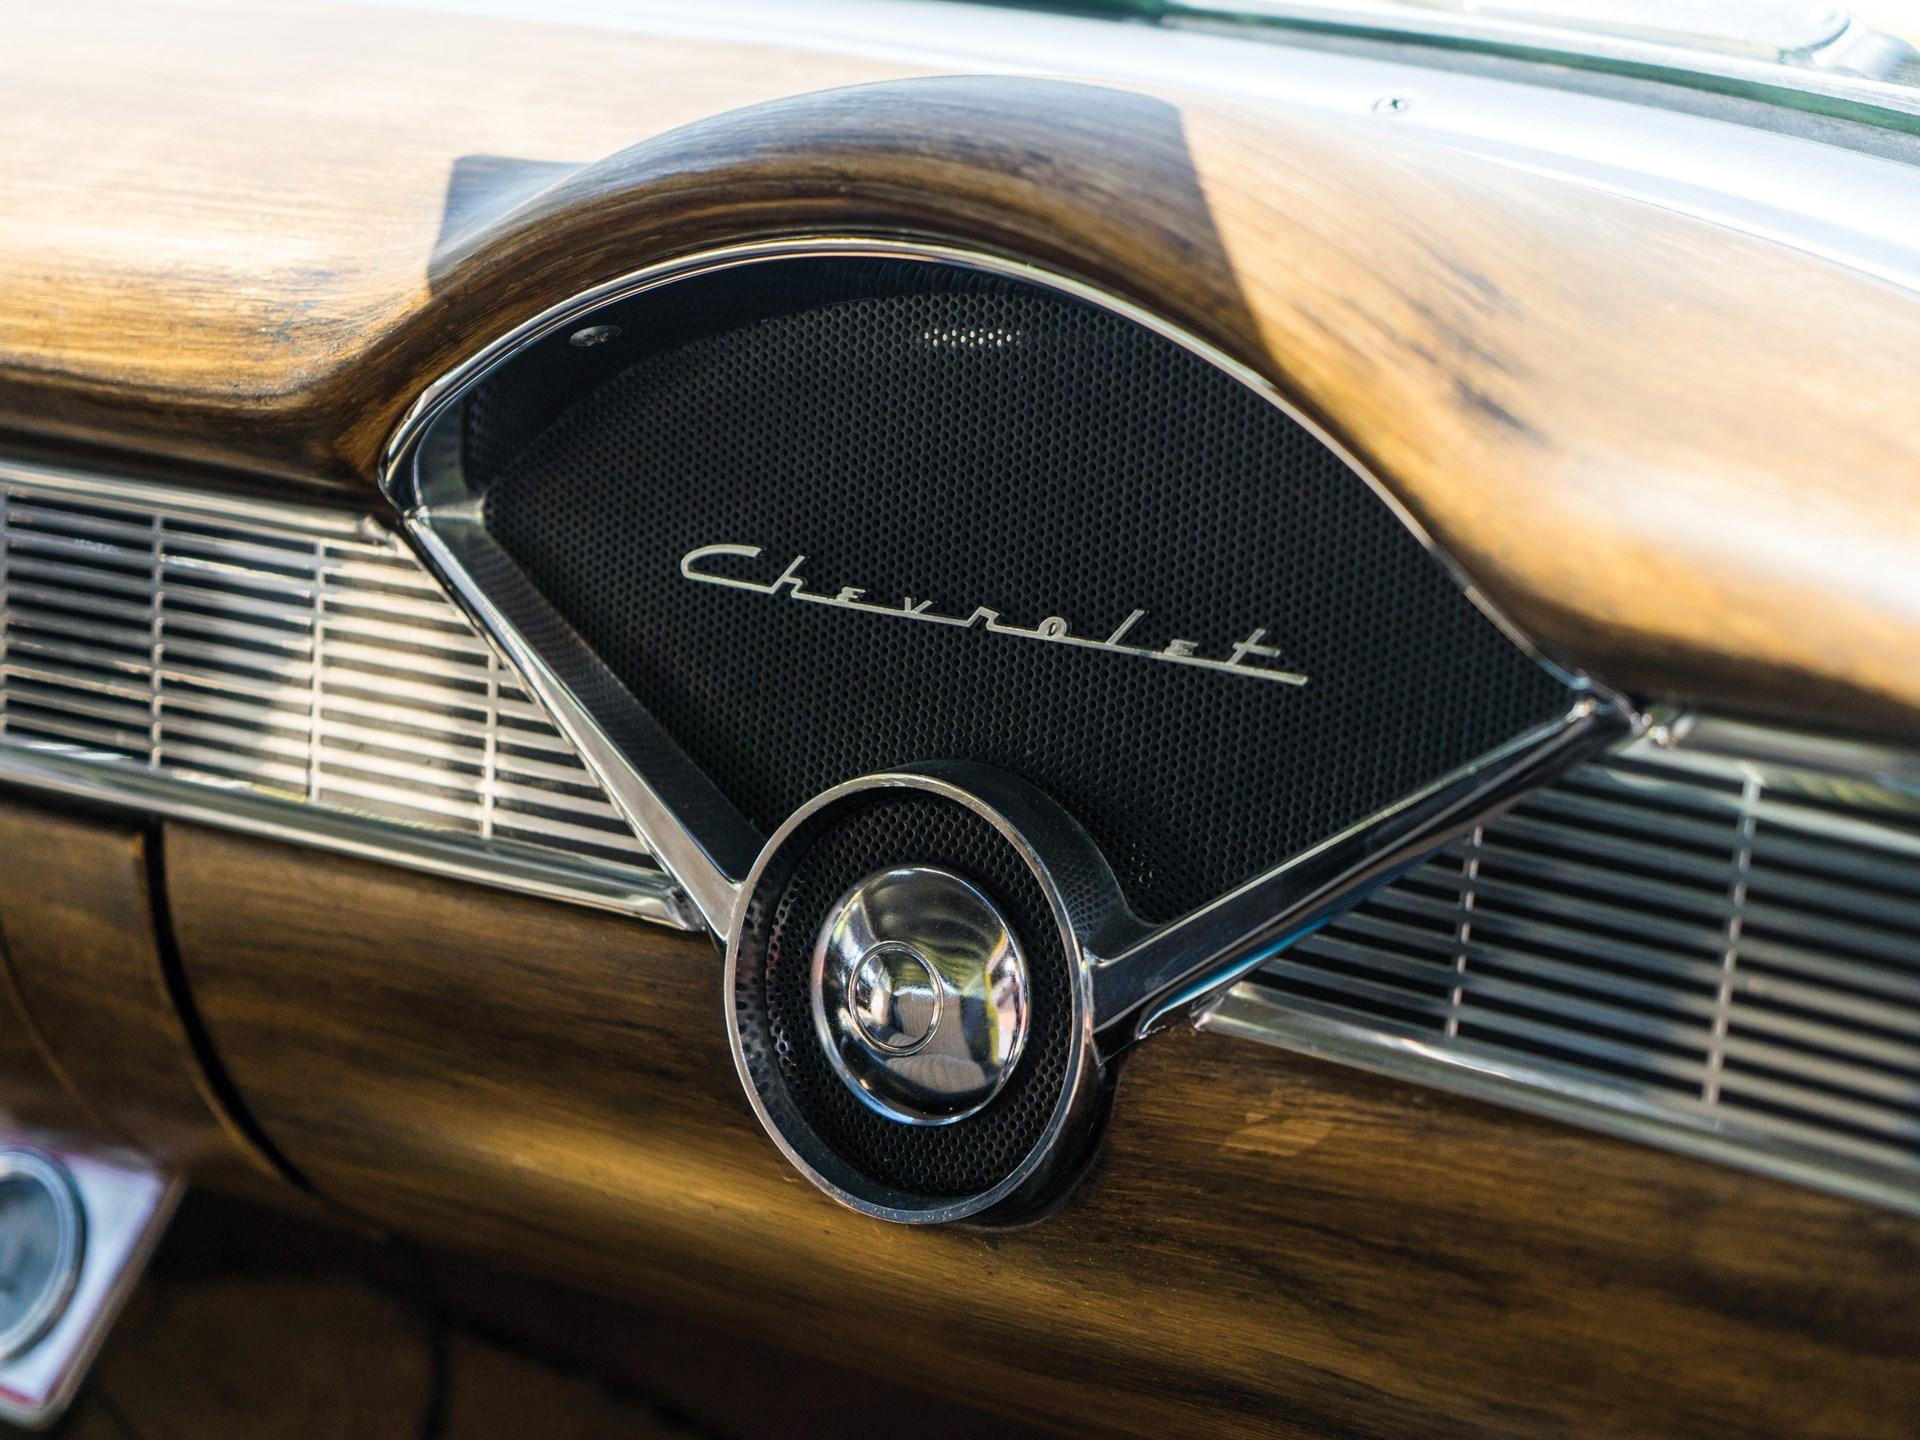 Rm Sothebys 1956 Chevrolet 210 H Stock Drag Car Hershey 2017 1957 Chevy Bel Air